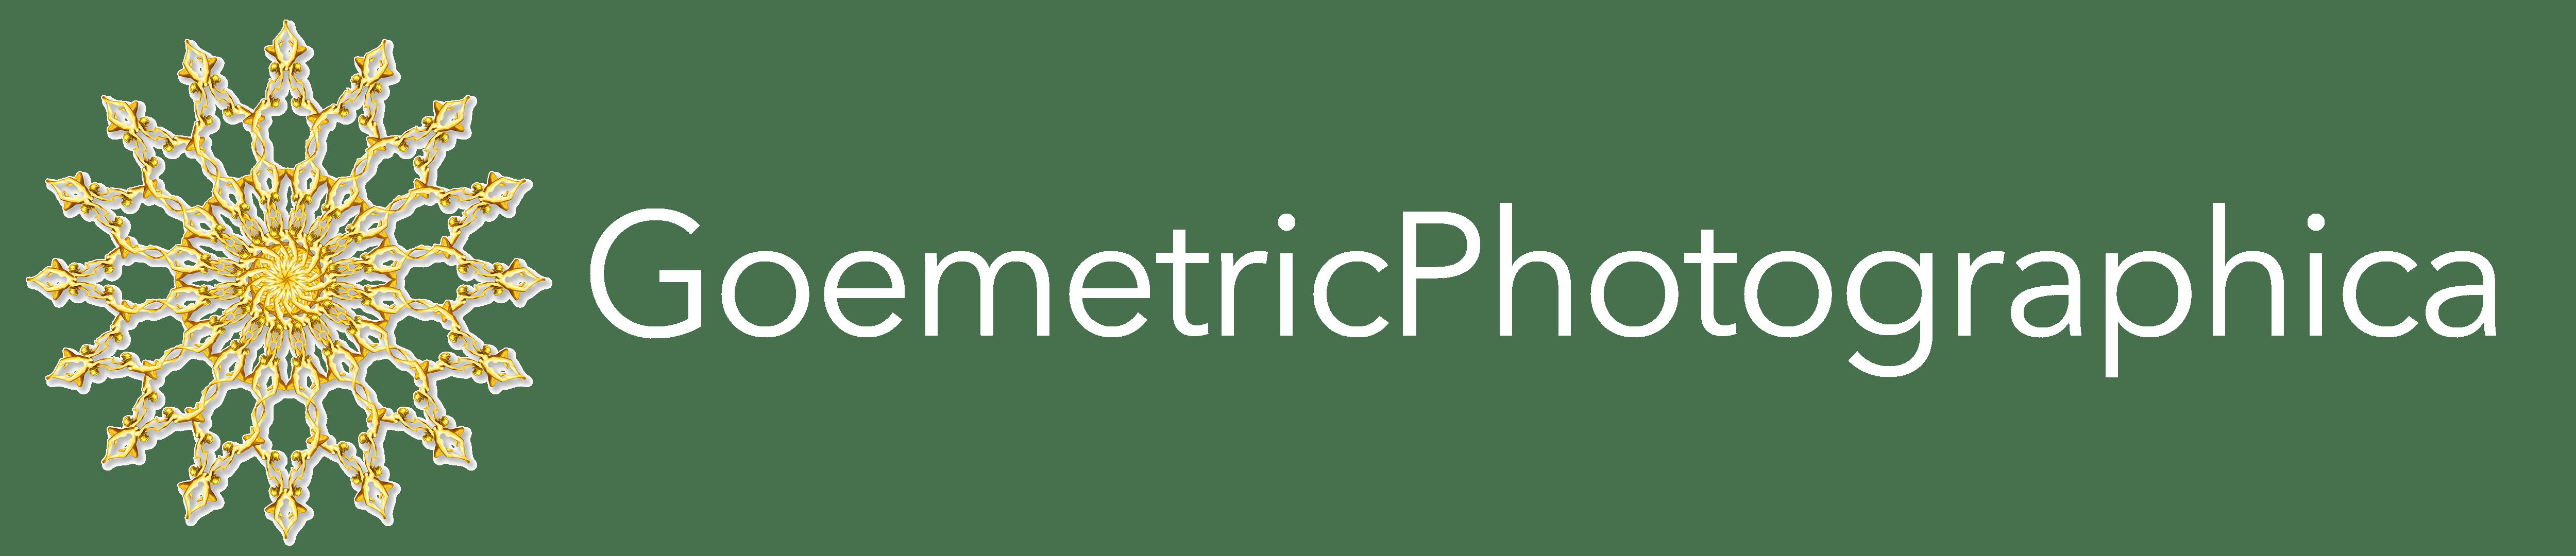 geometricphotographica